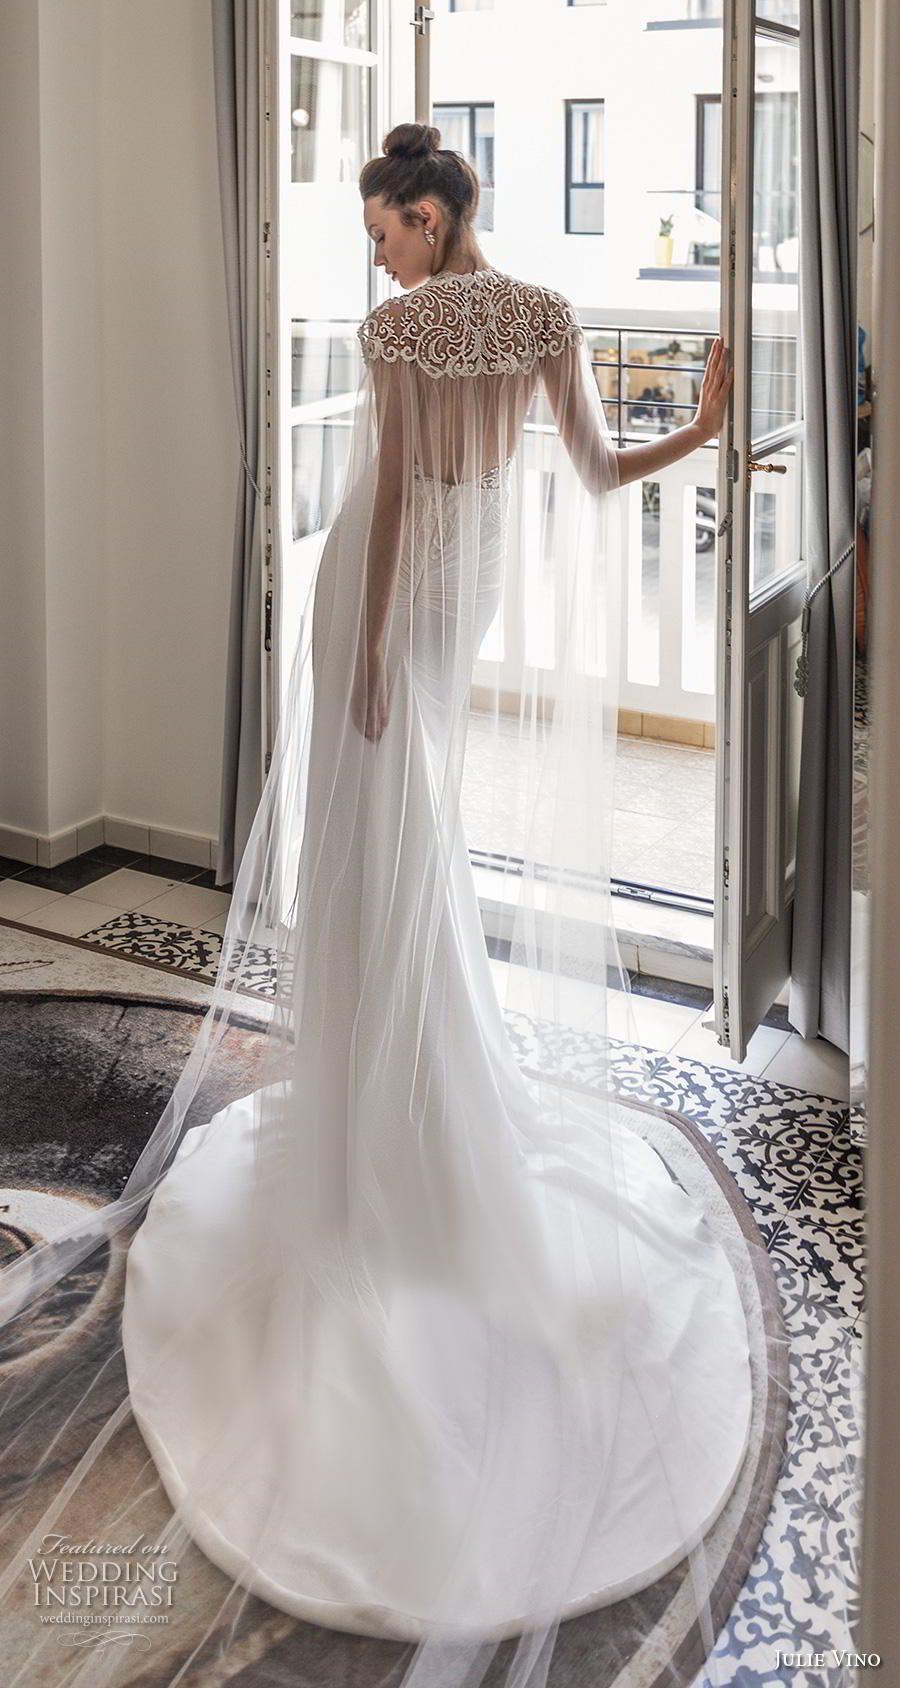 Romanzo By Julie Vino 2020 Wedding Dresses The Royal Bridal Collection Wedding Inspirasi 2020 Wedding Dresses Short Bridal Dress Wedding Dresses [ 1688 x 900 Pixel ]